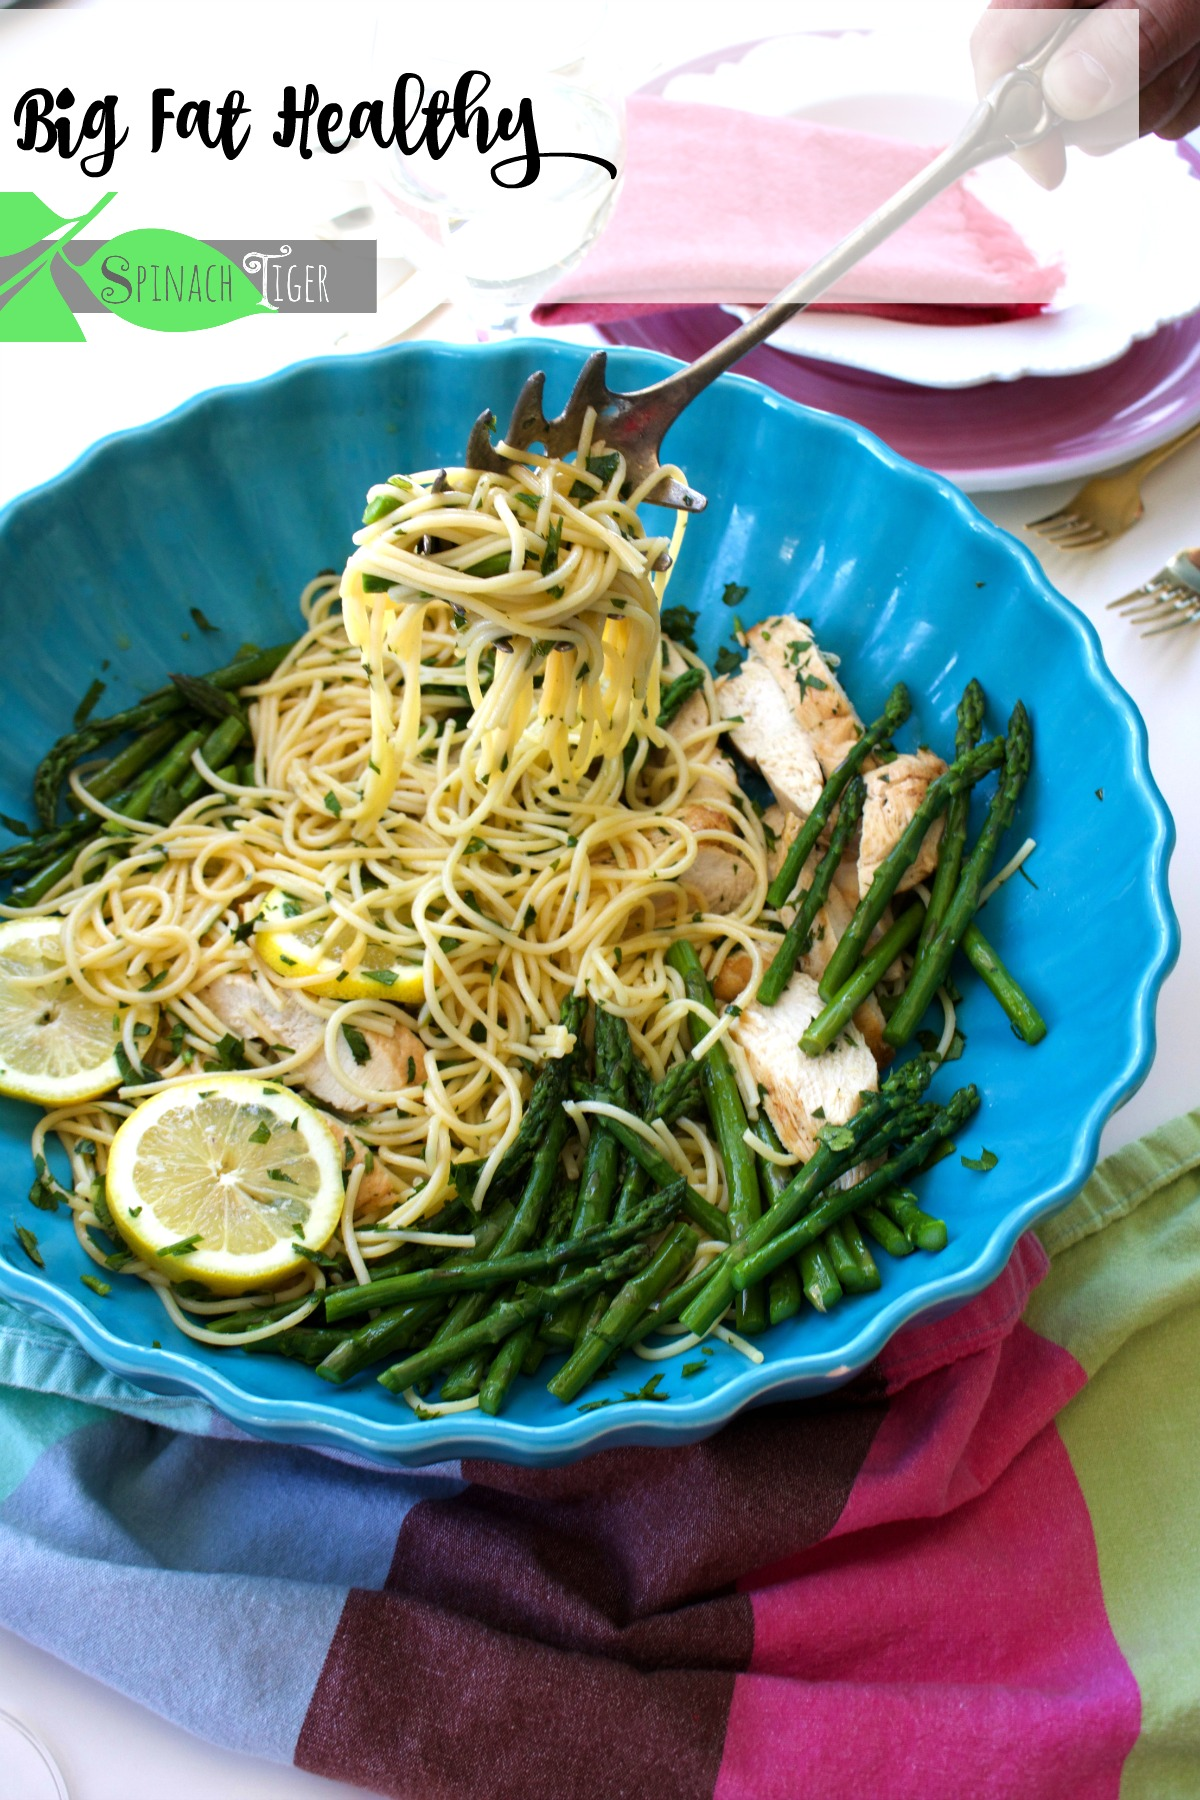 Chicken Asparagus Pasta, Healthy Chicken Pasta Recipes from Spinach Tiger